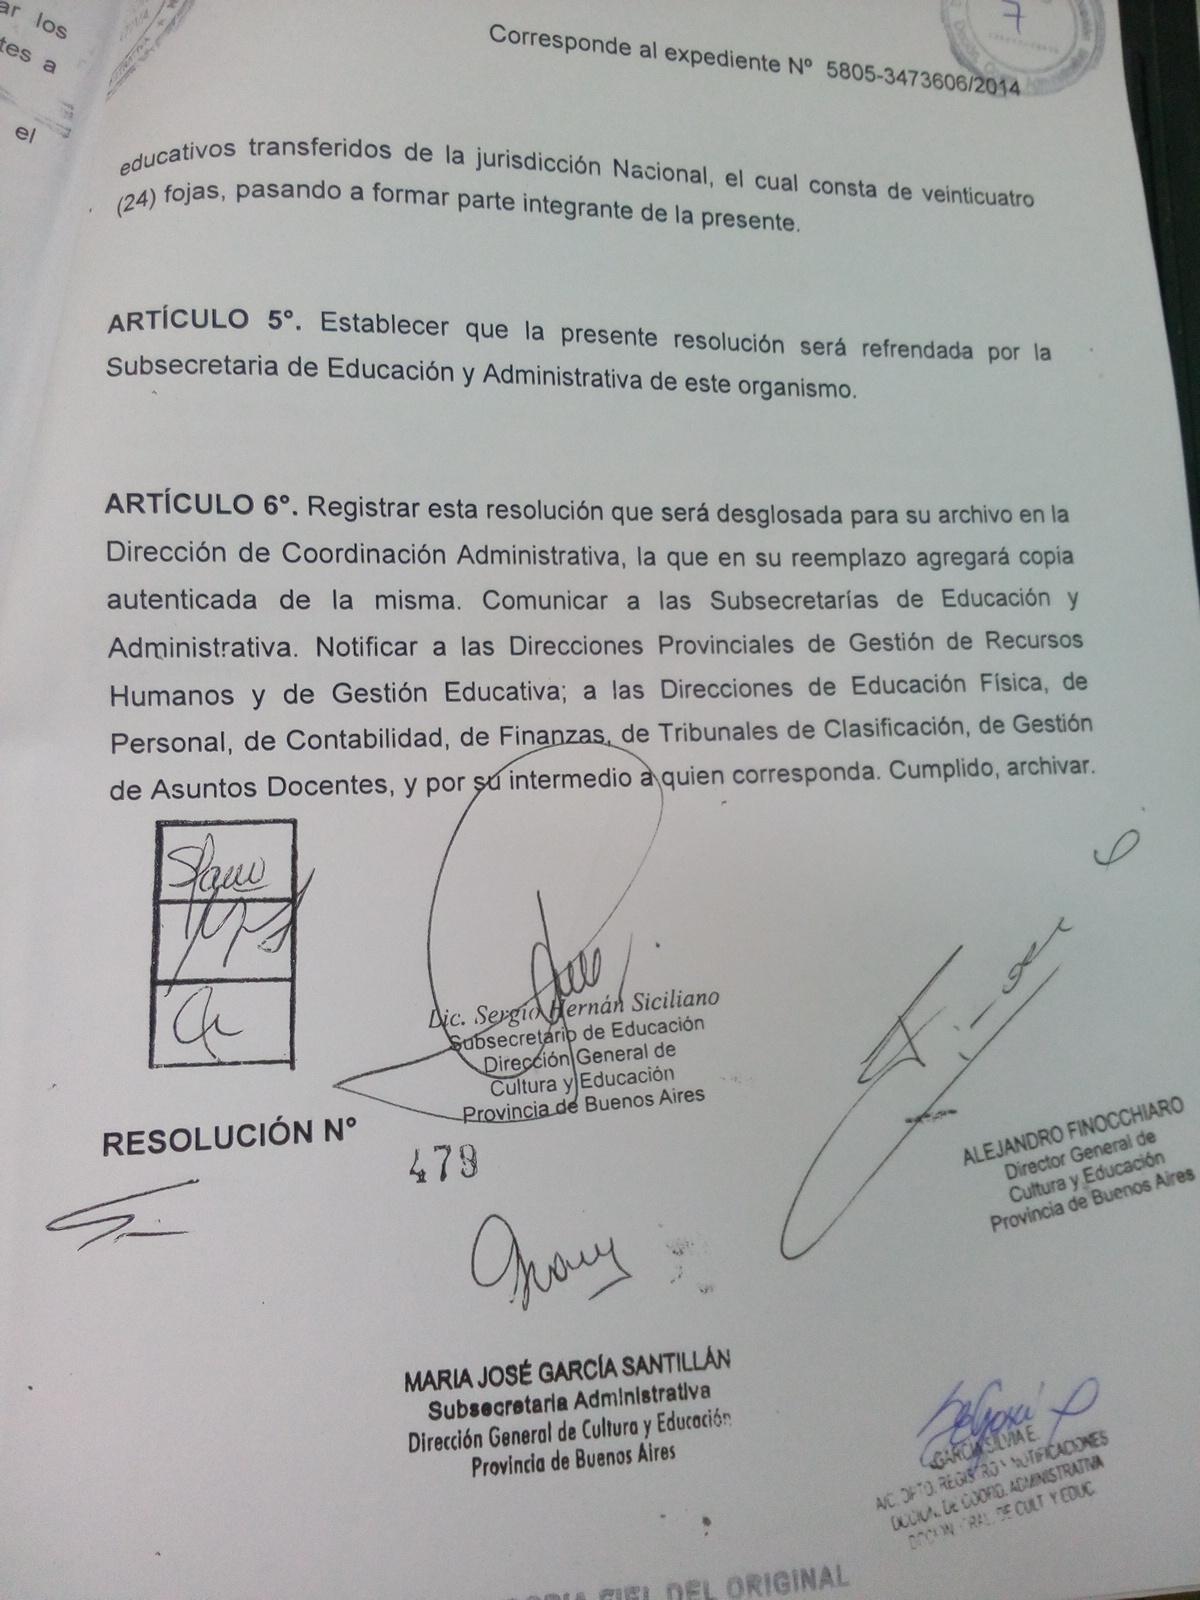 General rodriguez comunicado n 309 16 resoluci n 479 16 for Resolucion docentes 2016